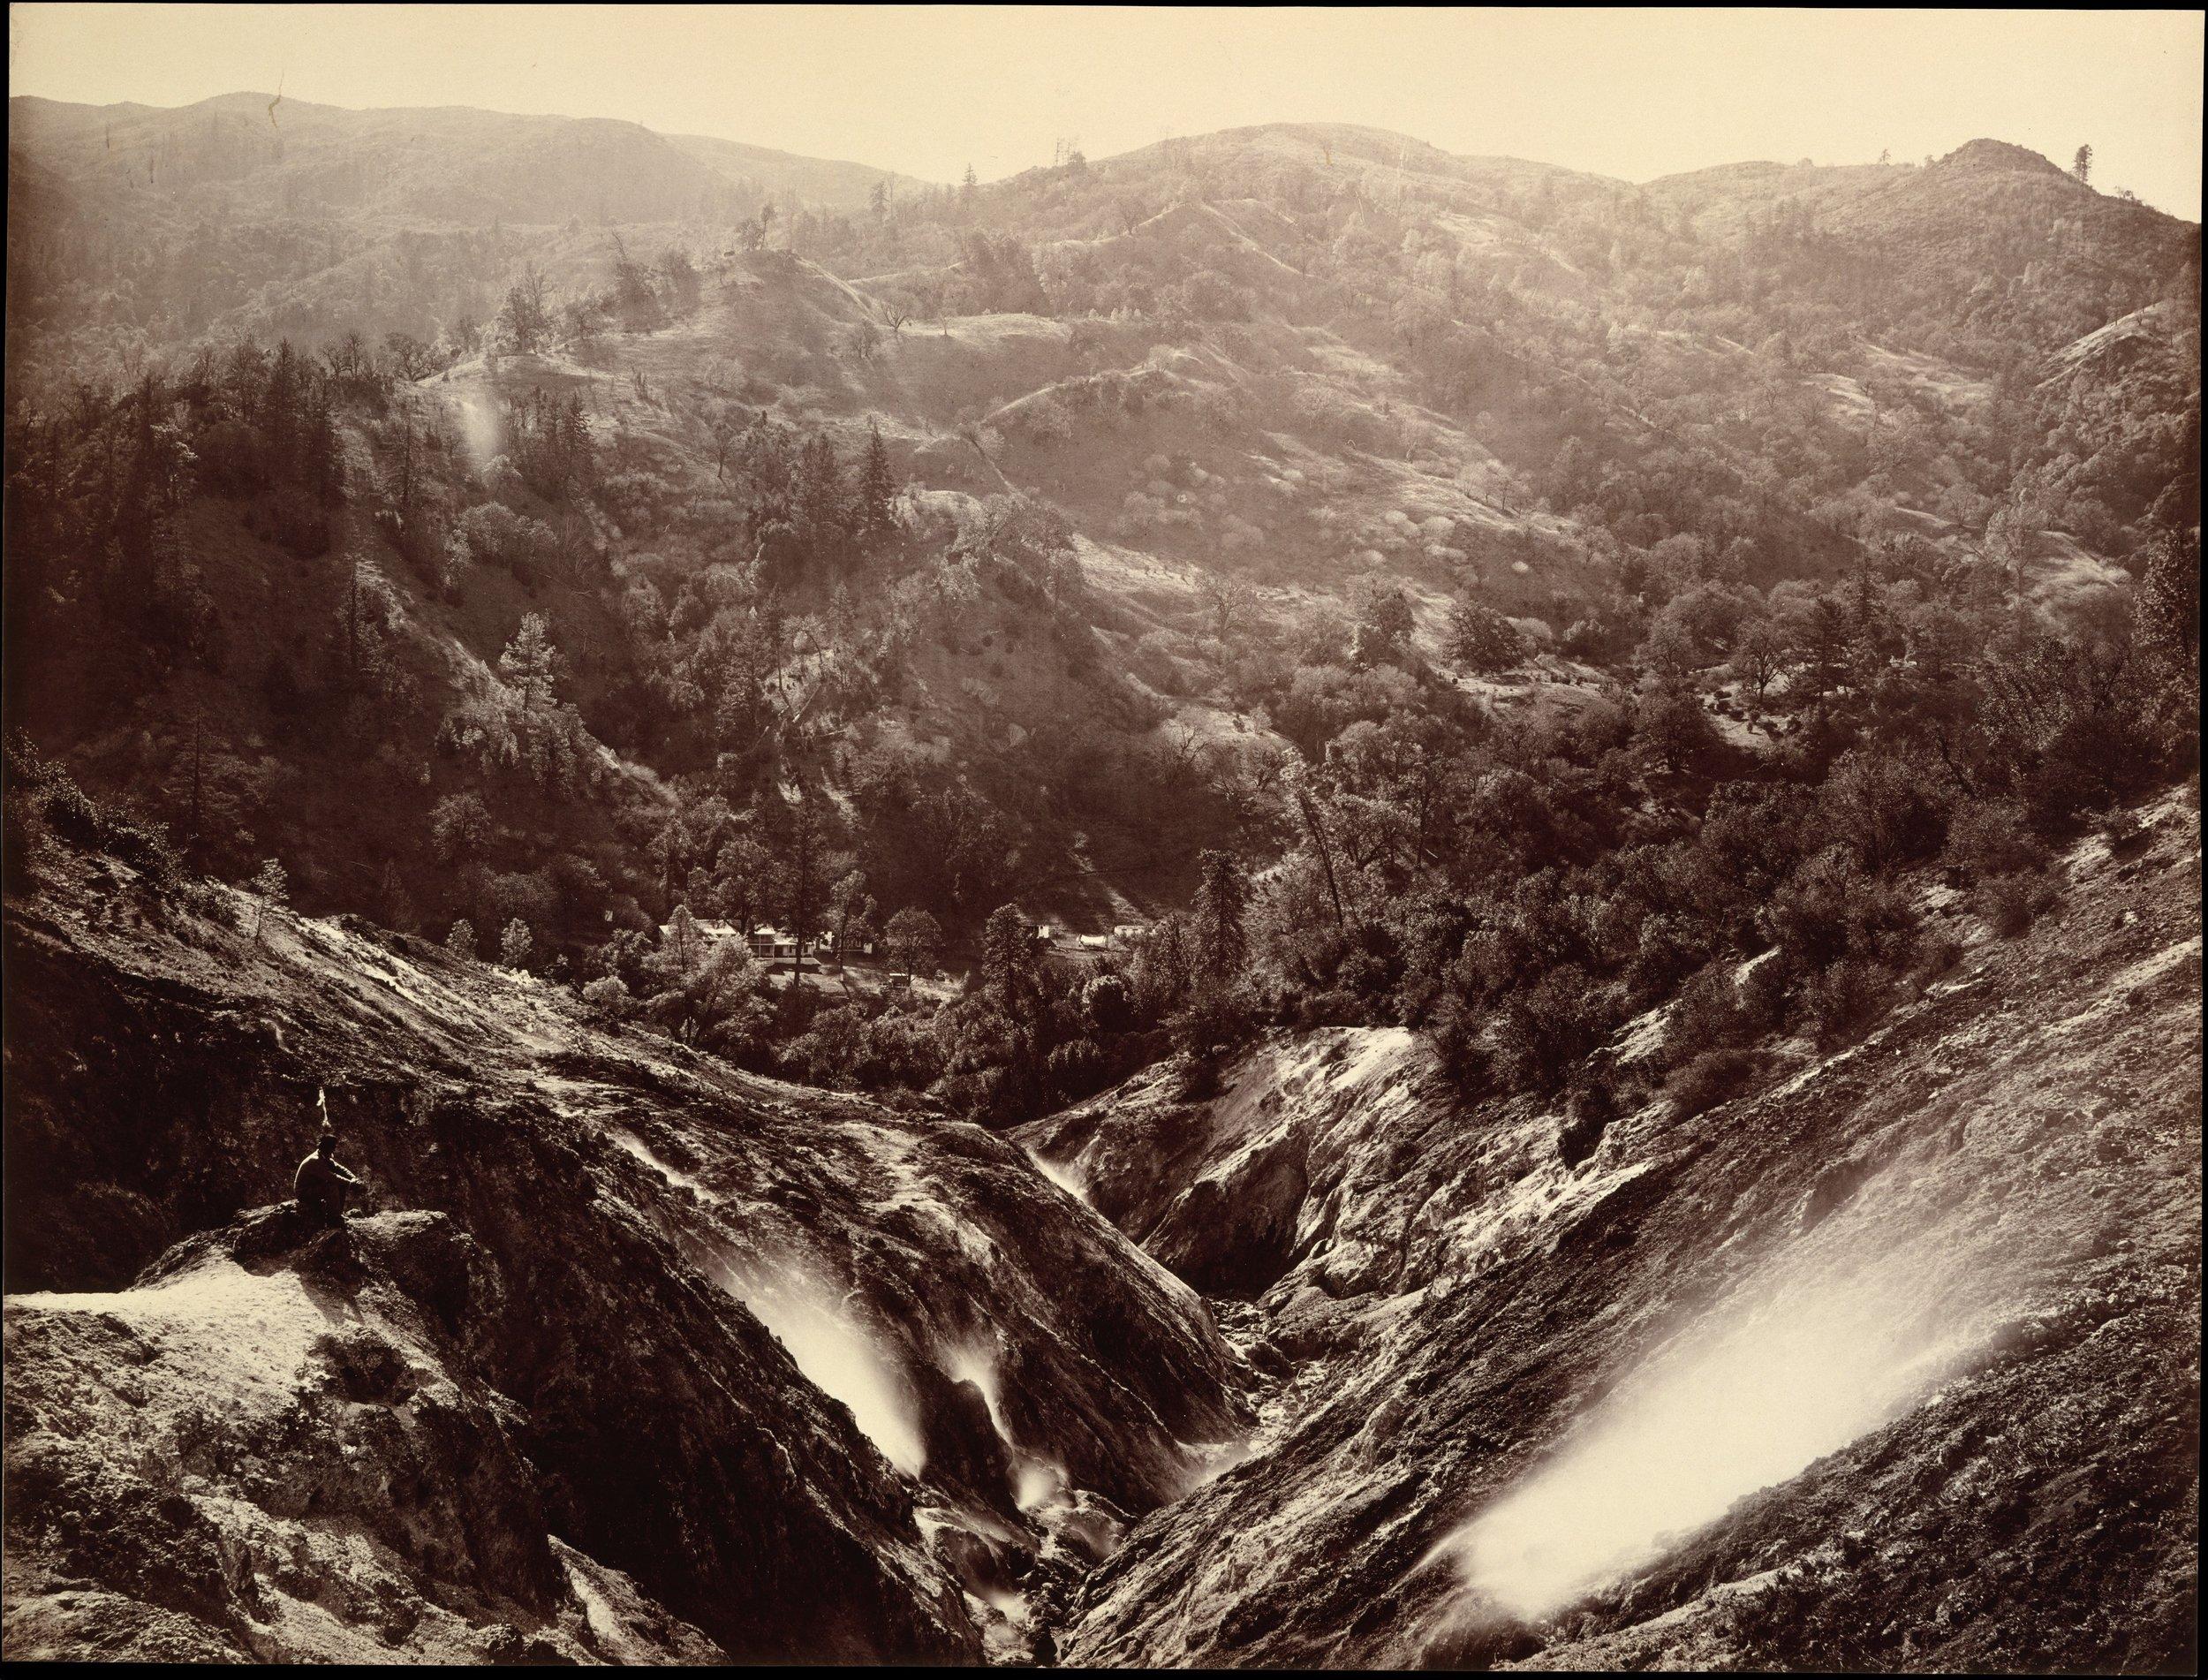 Carleton Watkins, Devil's Canyon, Geysers, Looking Down , 1868-70. Image credit: The Metropolitan Museum of Art, Rogers Fund, 1989 .